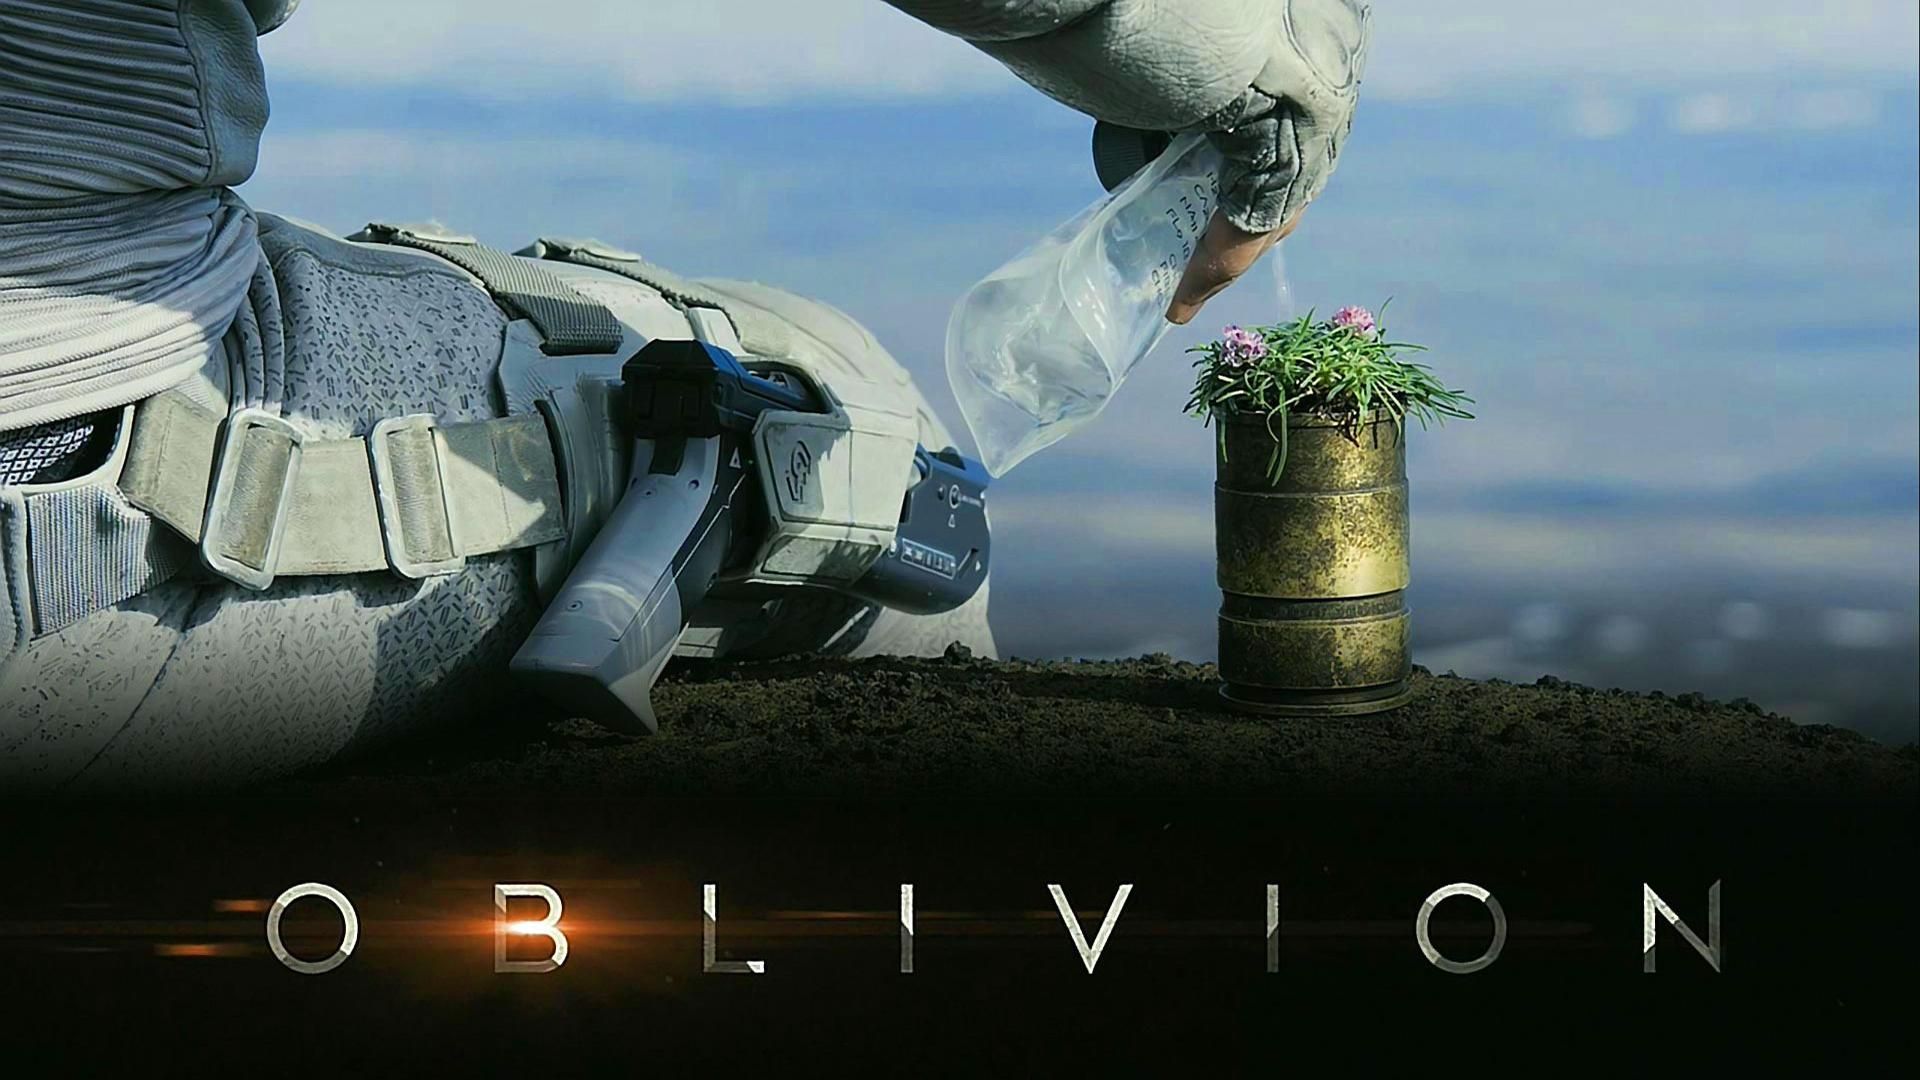 oblivion-1489740.jpg